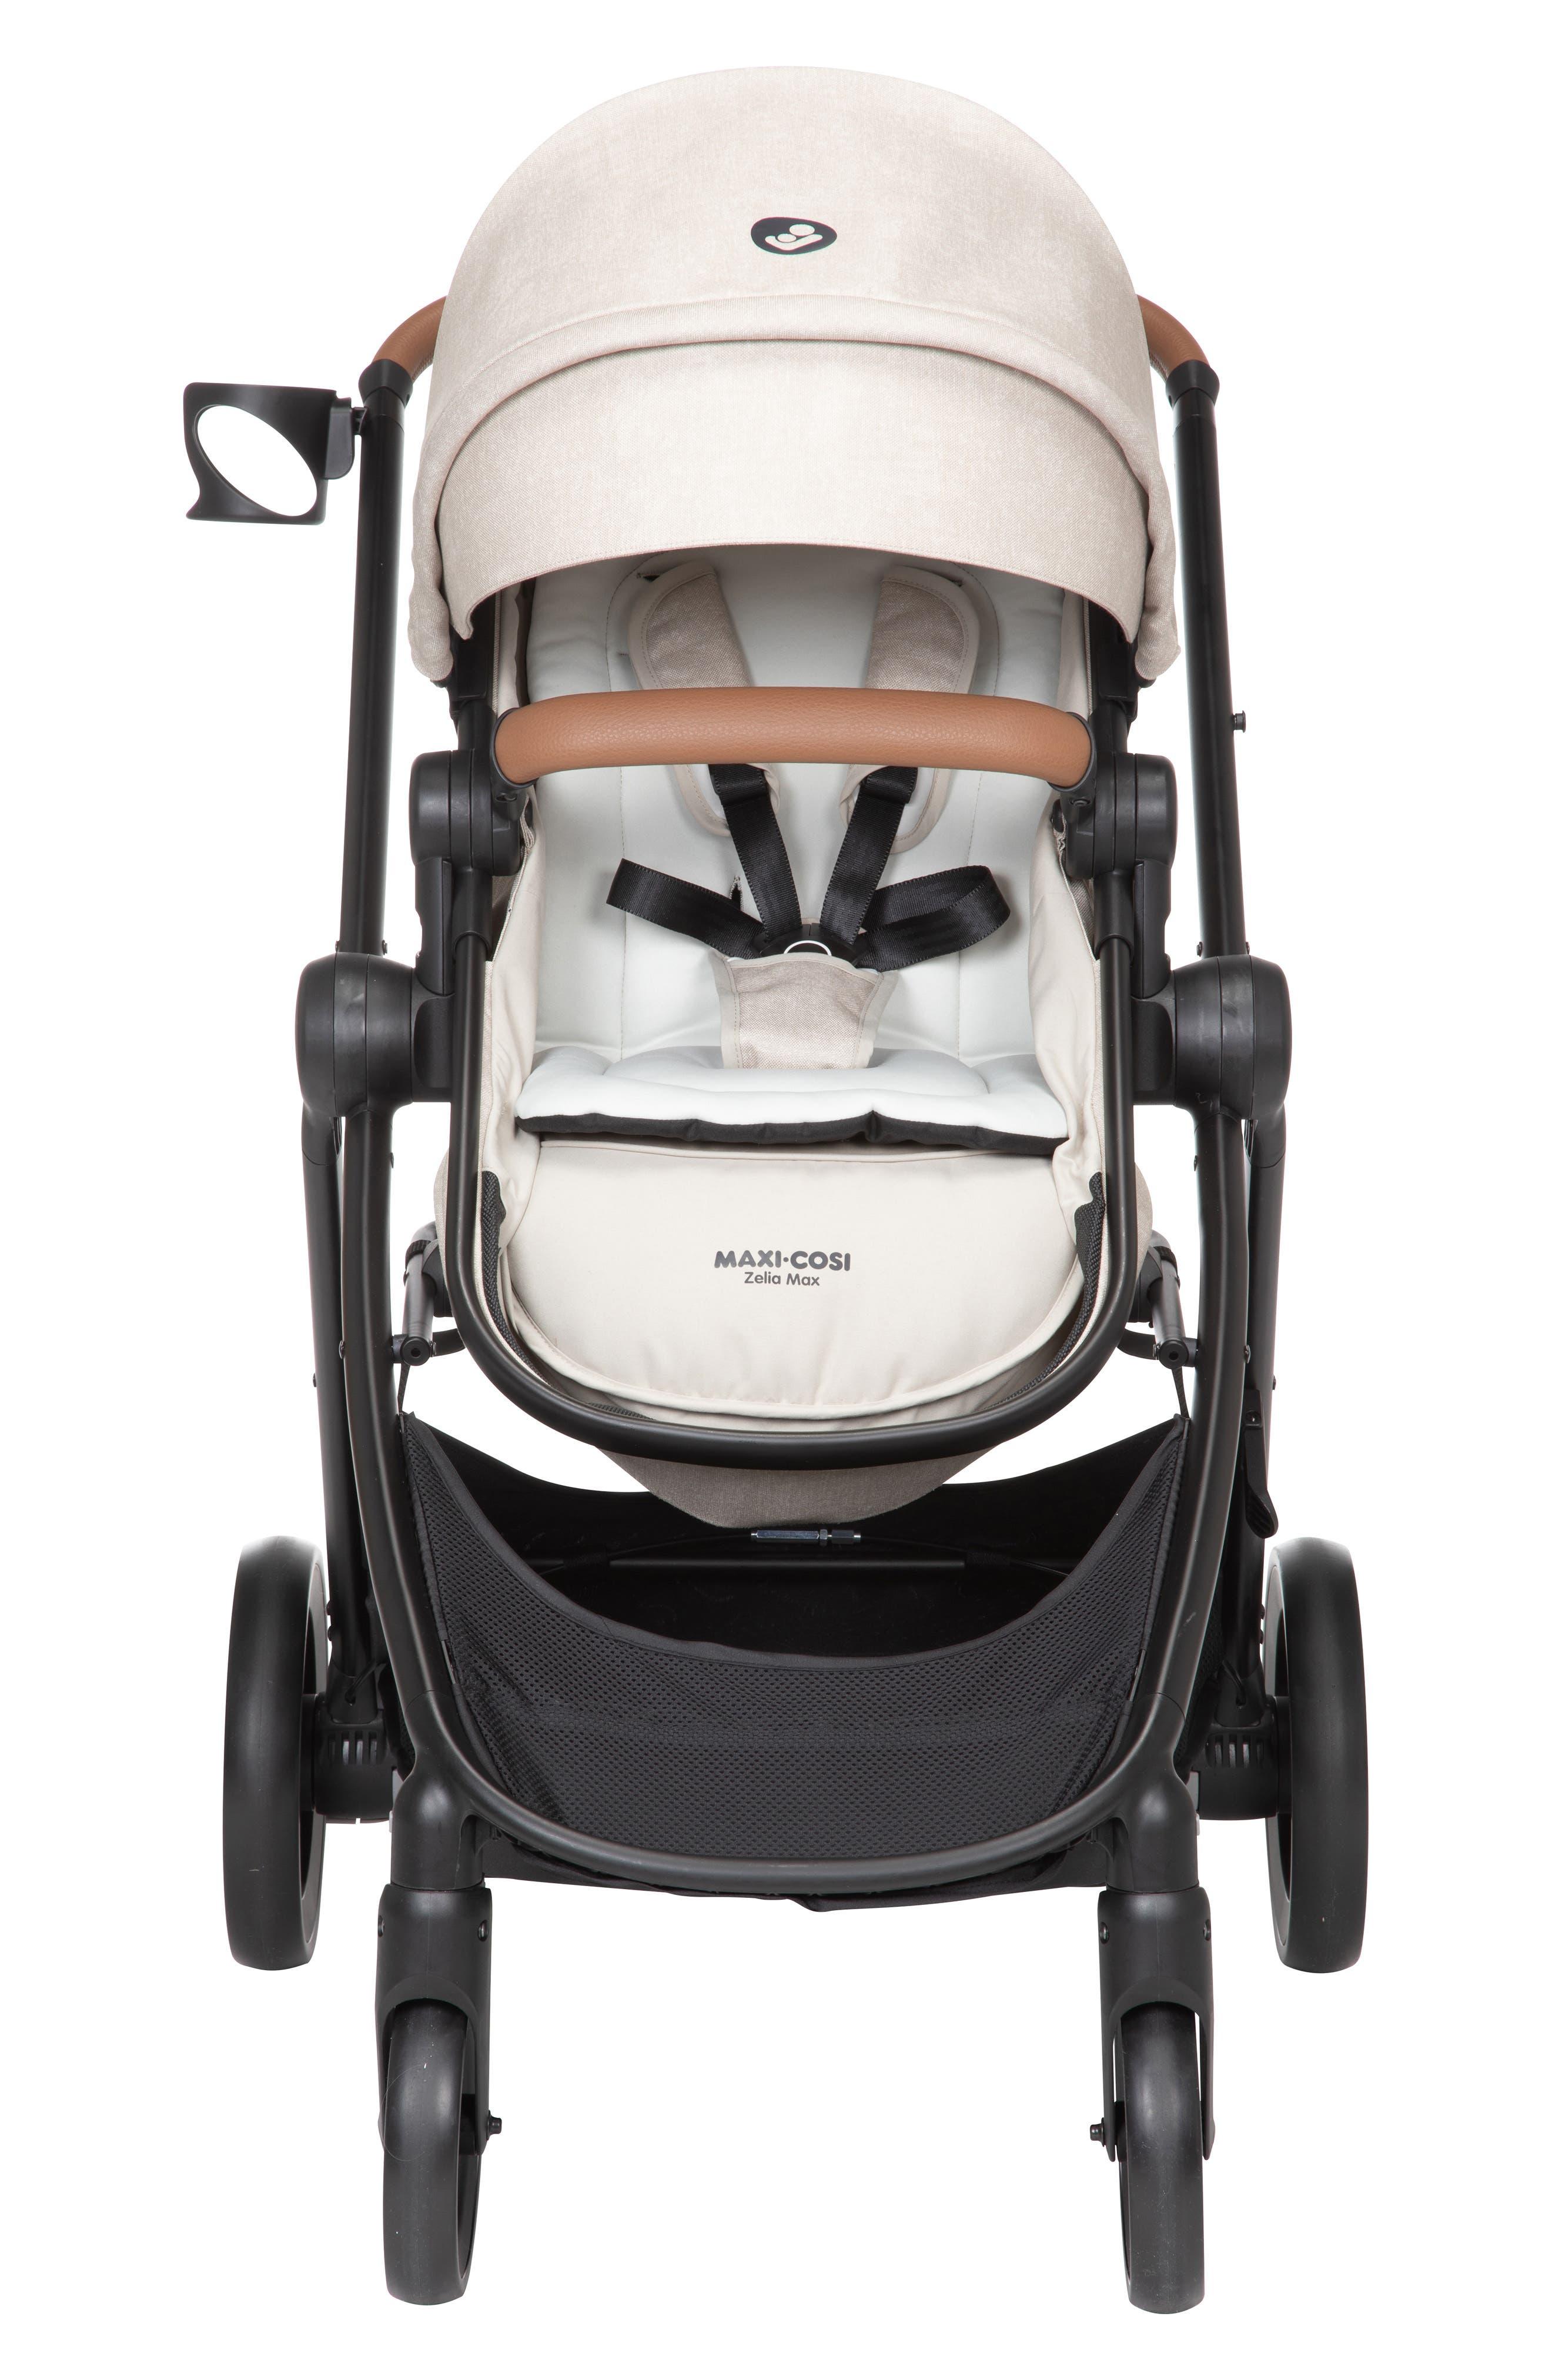 Infant MaxiCosi 51 Mico 30 Infant Car Seat  Zelia Stroller Modular Travel System Size One Size  Beige